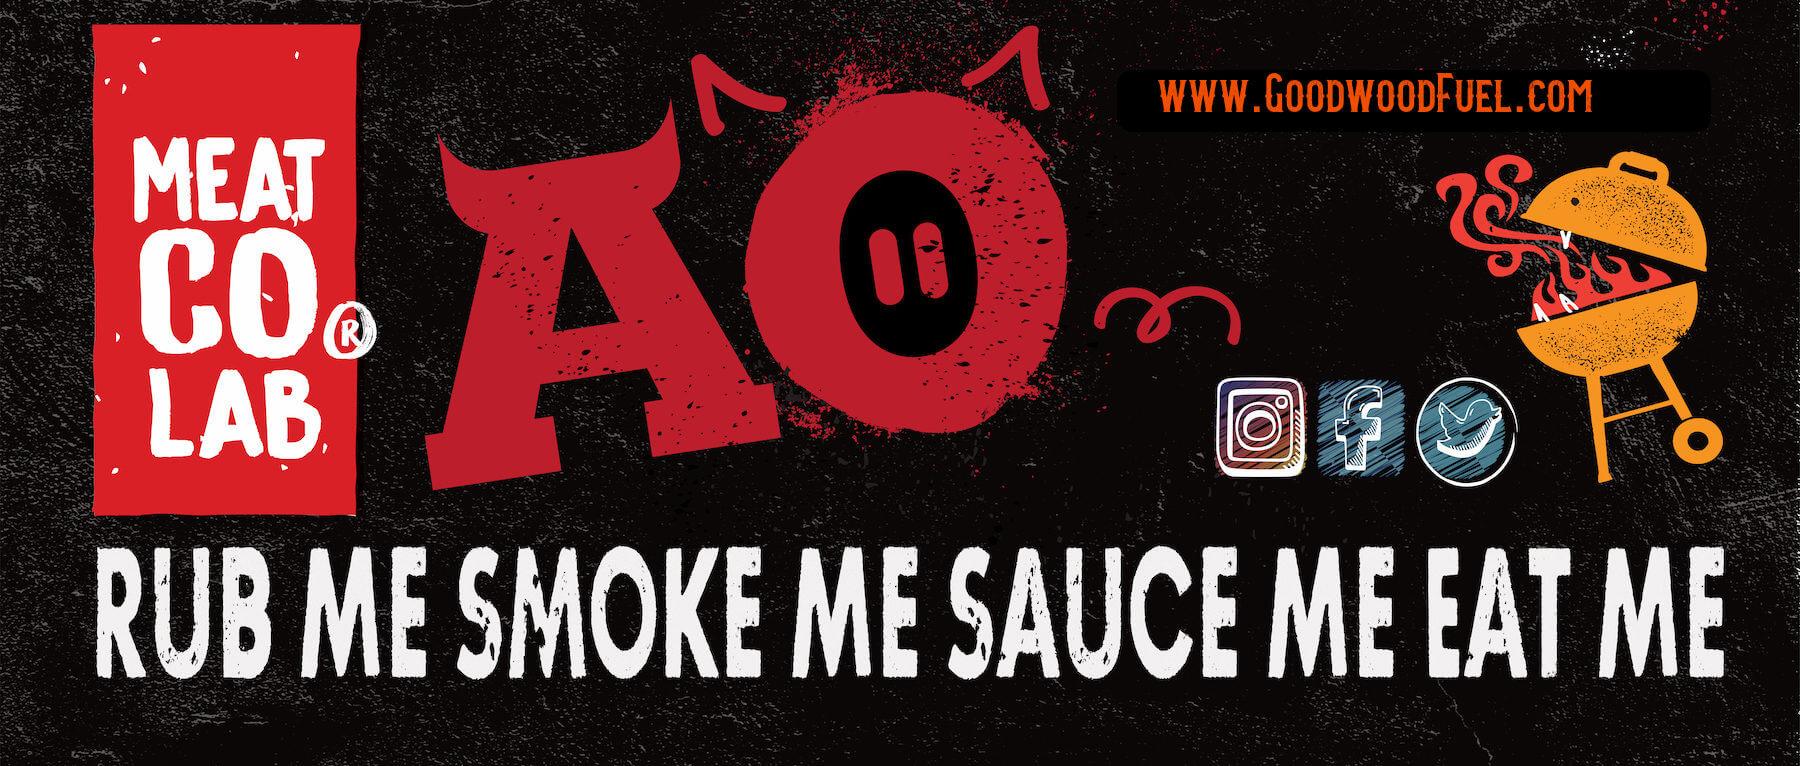 goodwood fuel bbq sauces